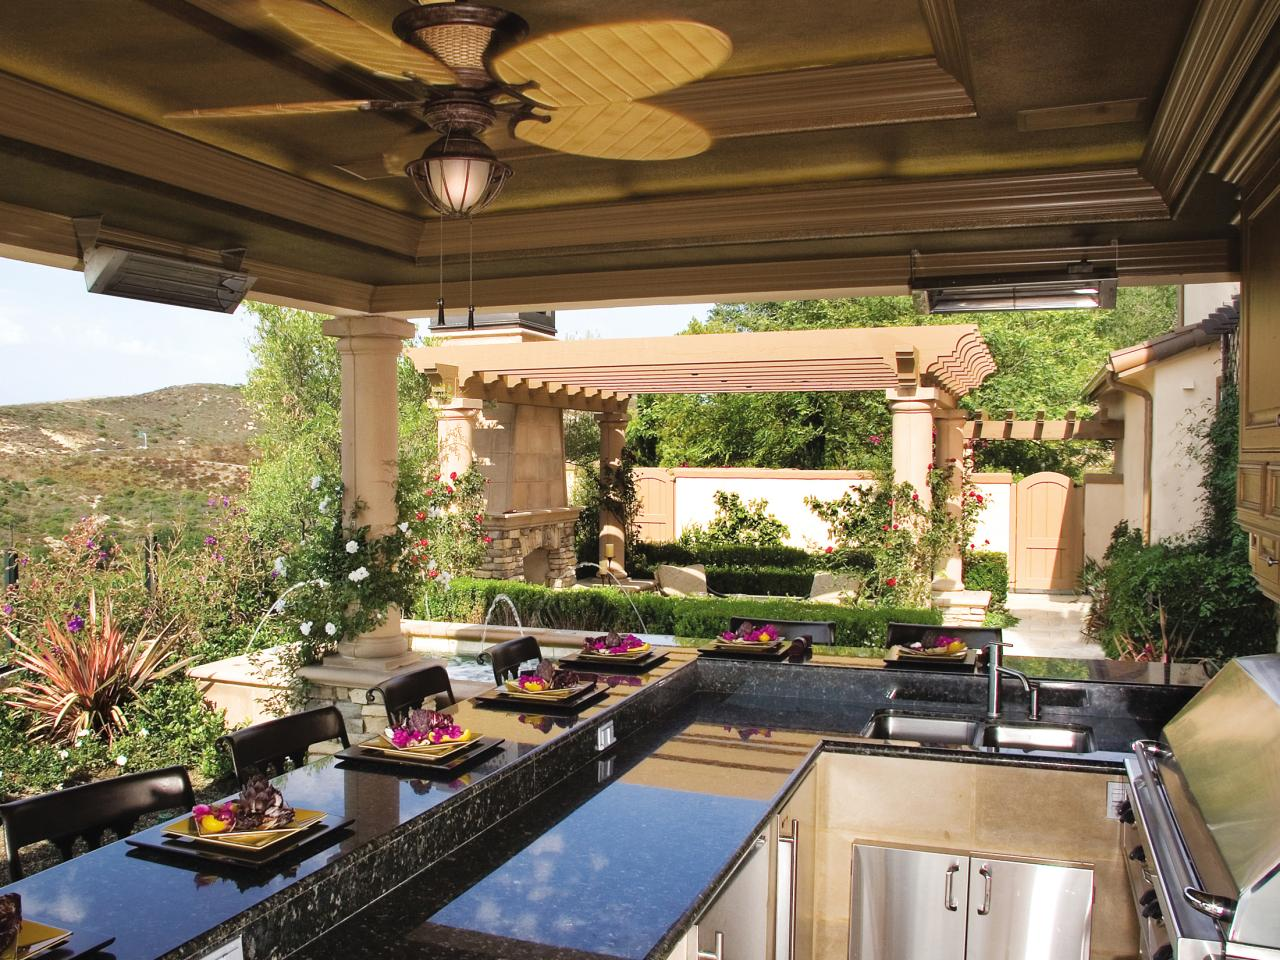 outdoor kitchen countertops options FAFXZSC